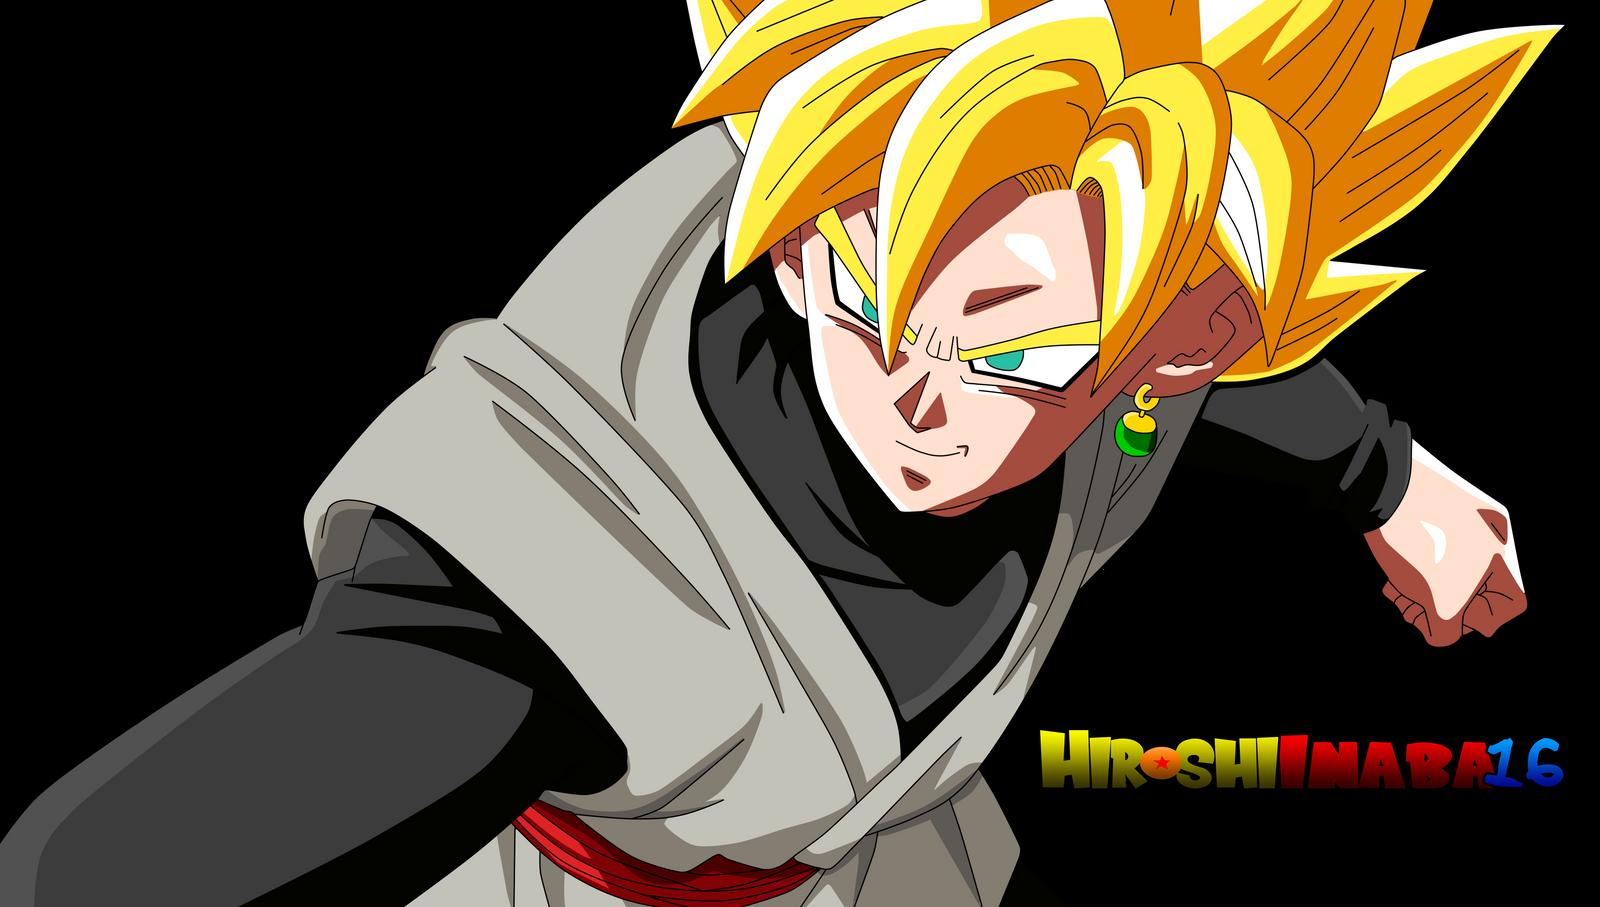 Black Goku ssj Normal by HiroshiIanabaModder on DeviantArt